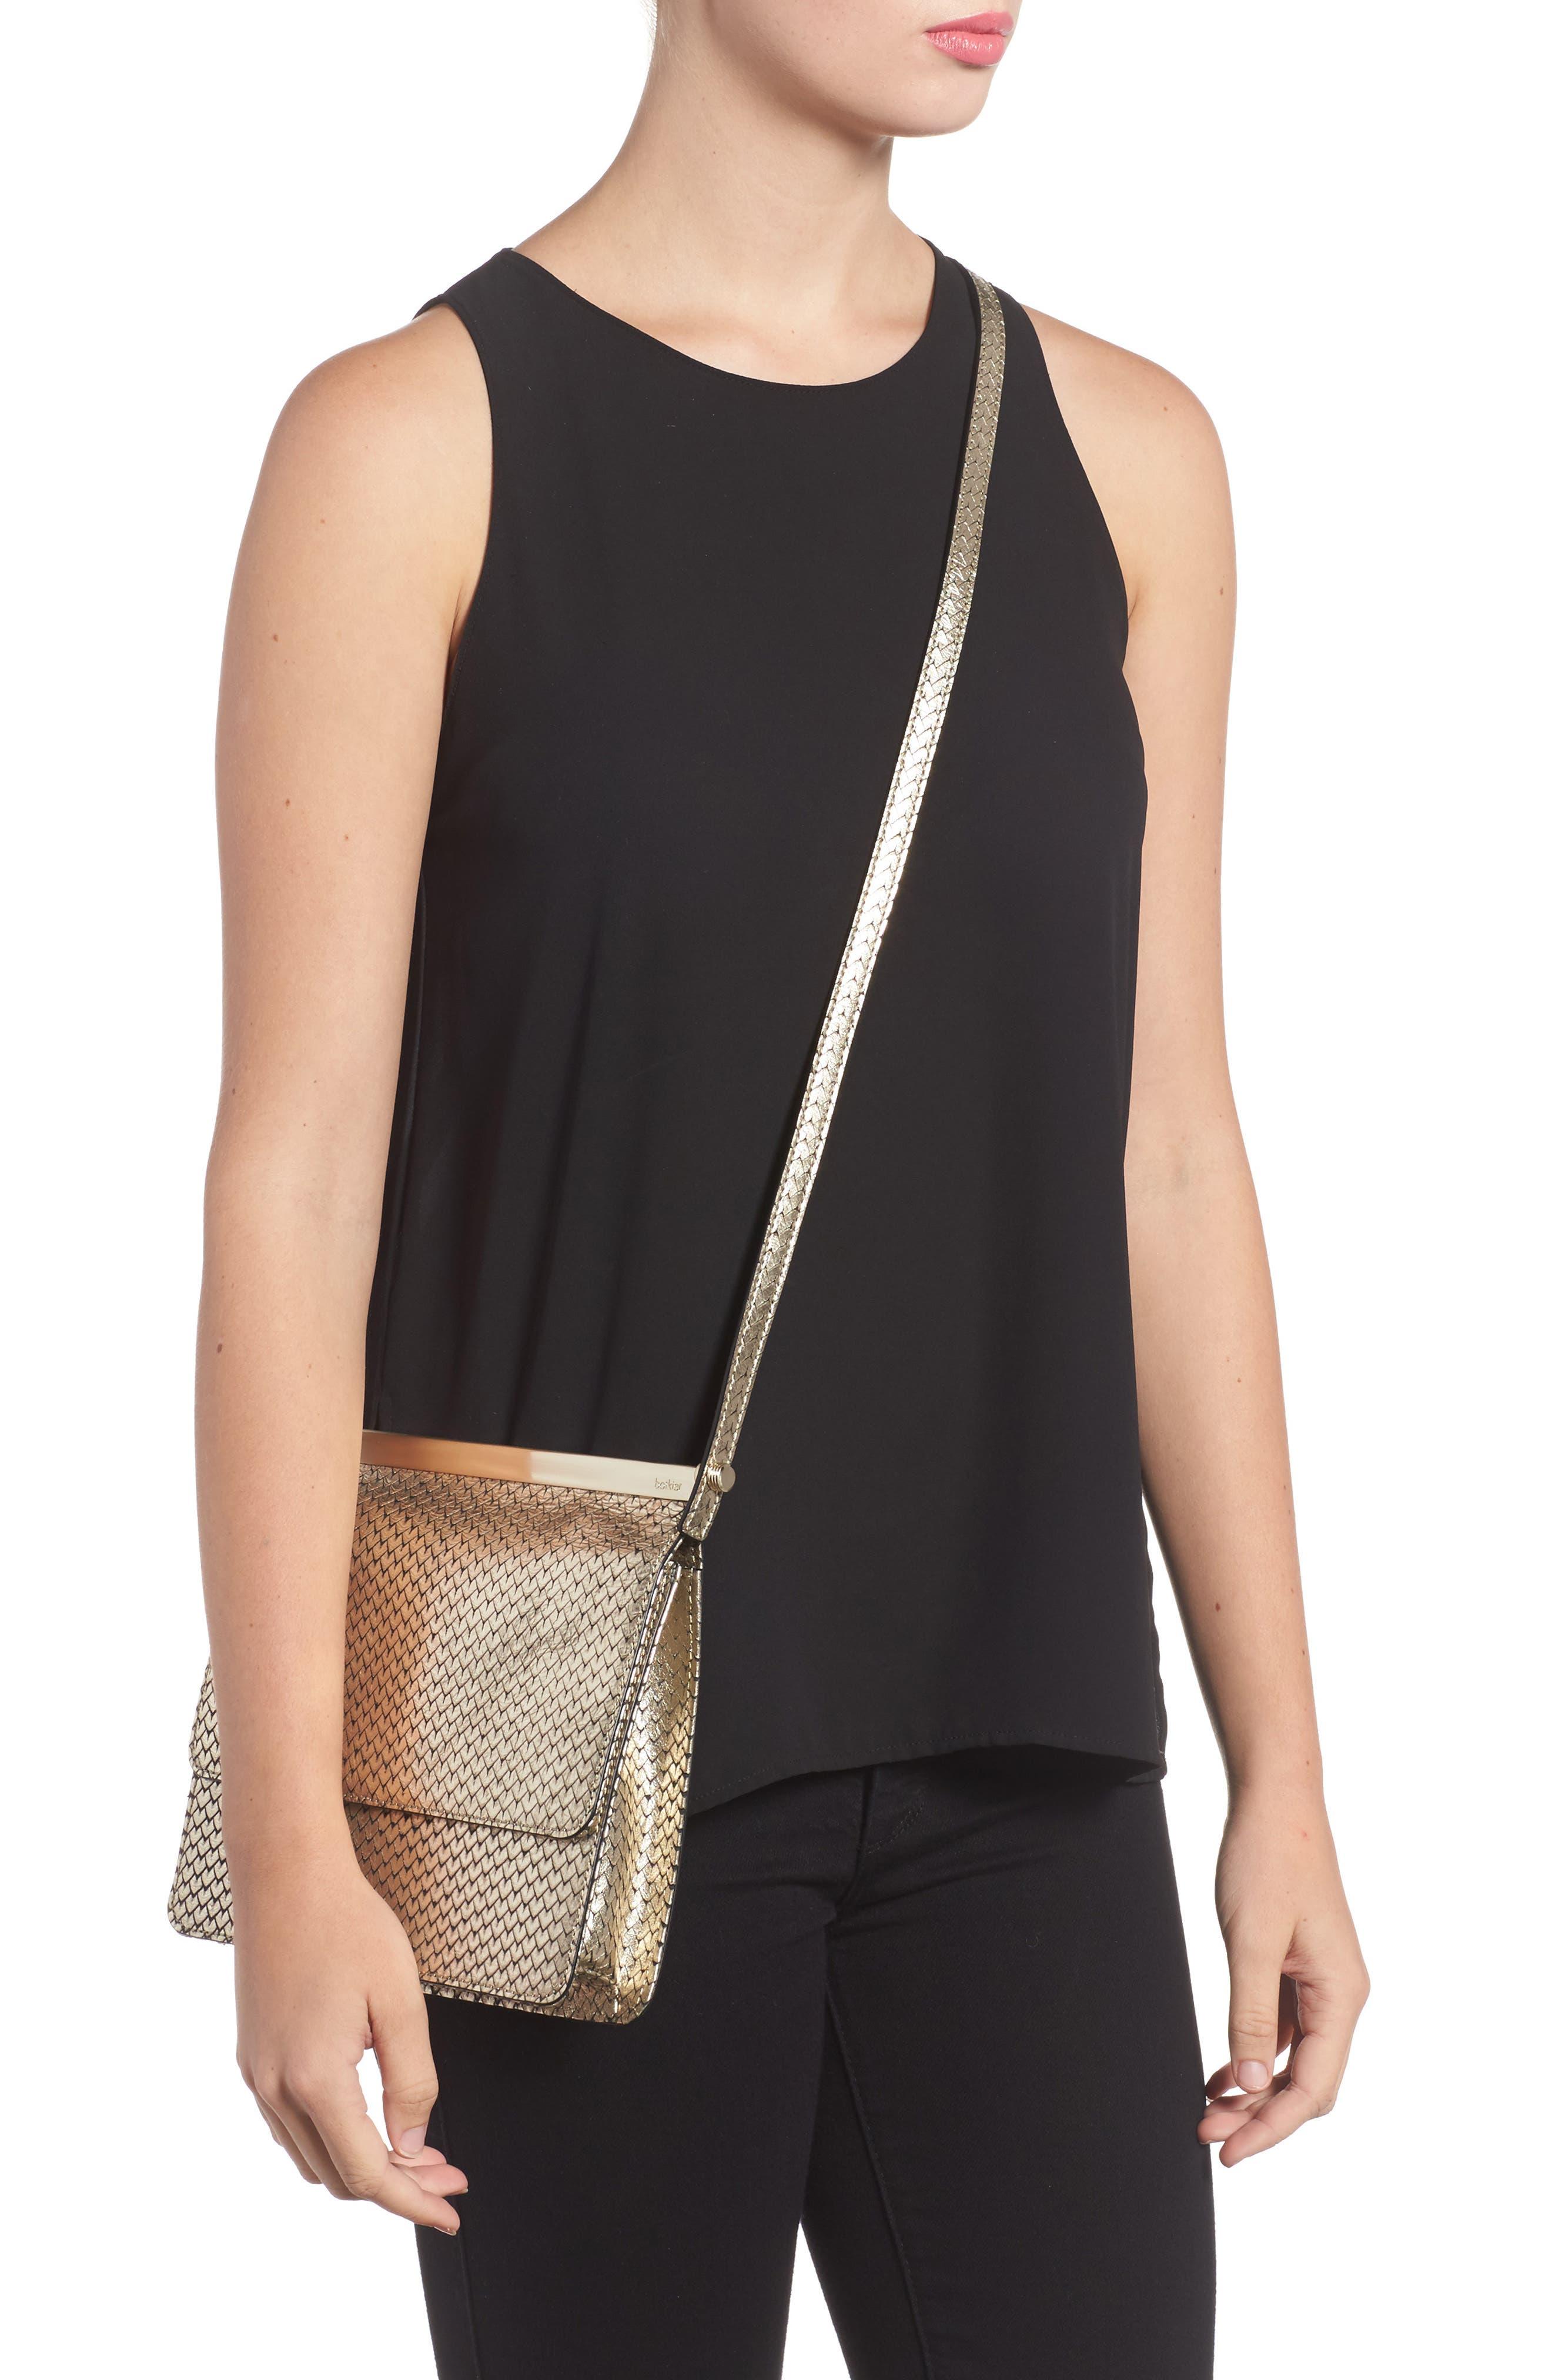 Crawford Calfskin Leather Crossbody Bag,                             Alternate thumbnail 2, color,                             Gold